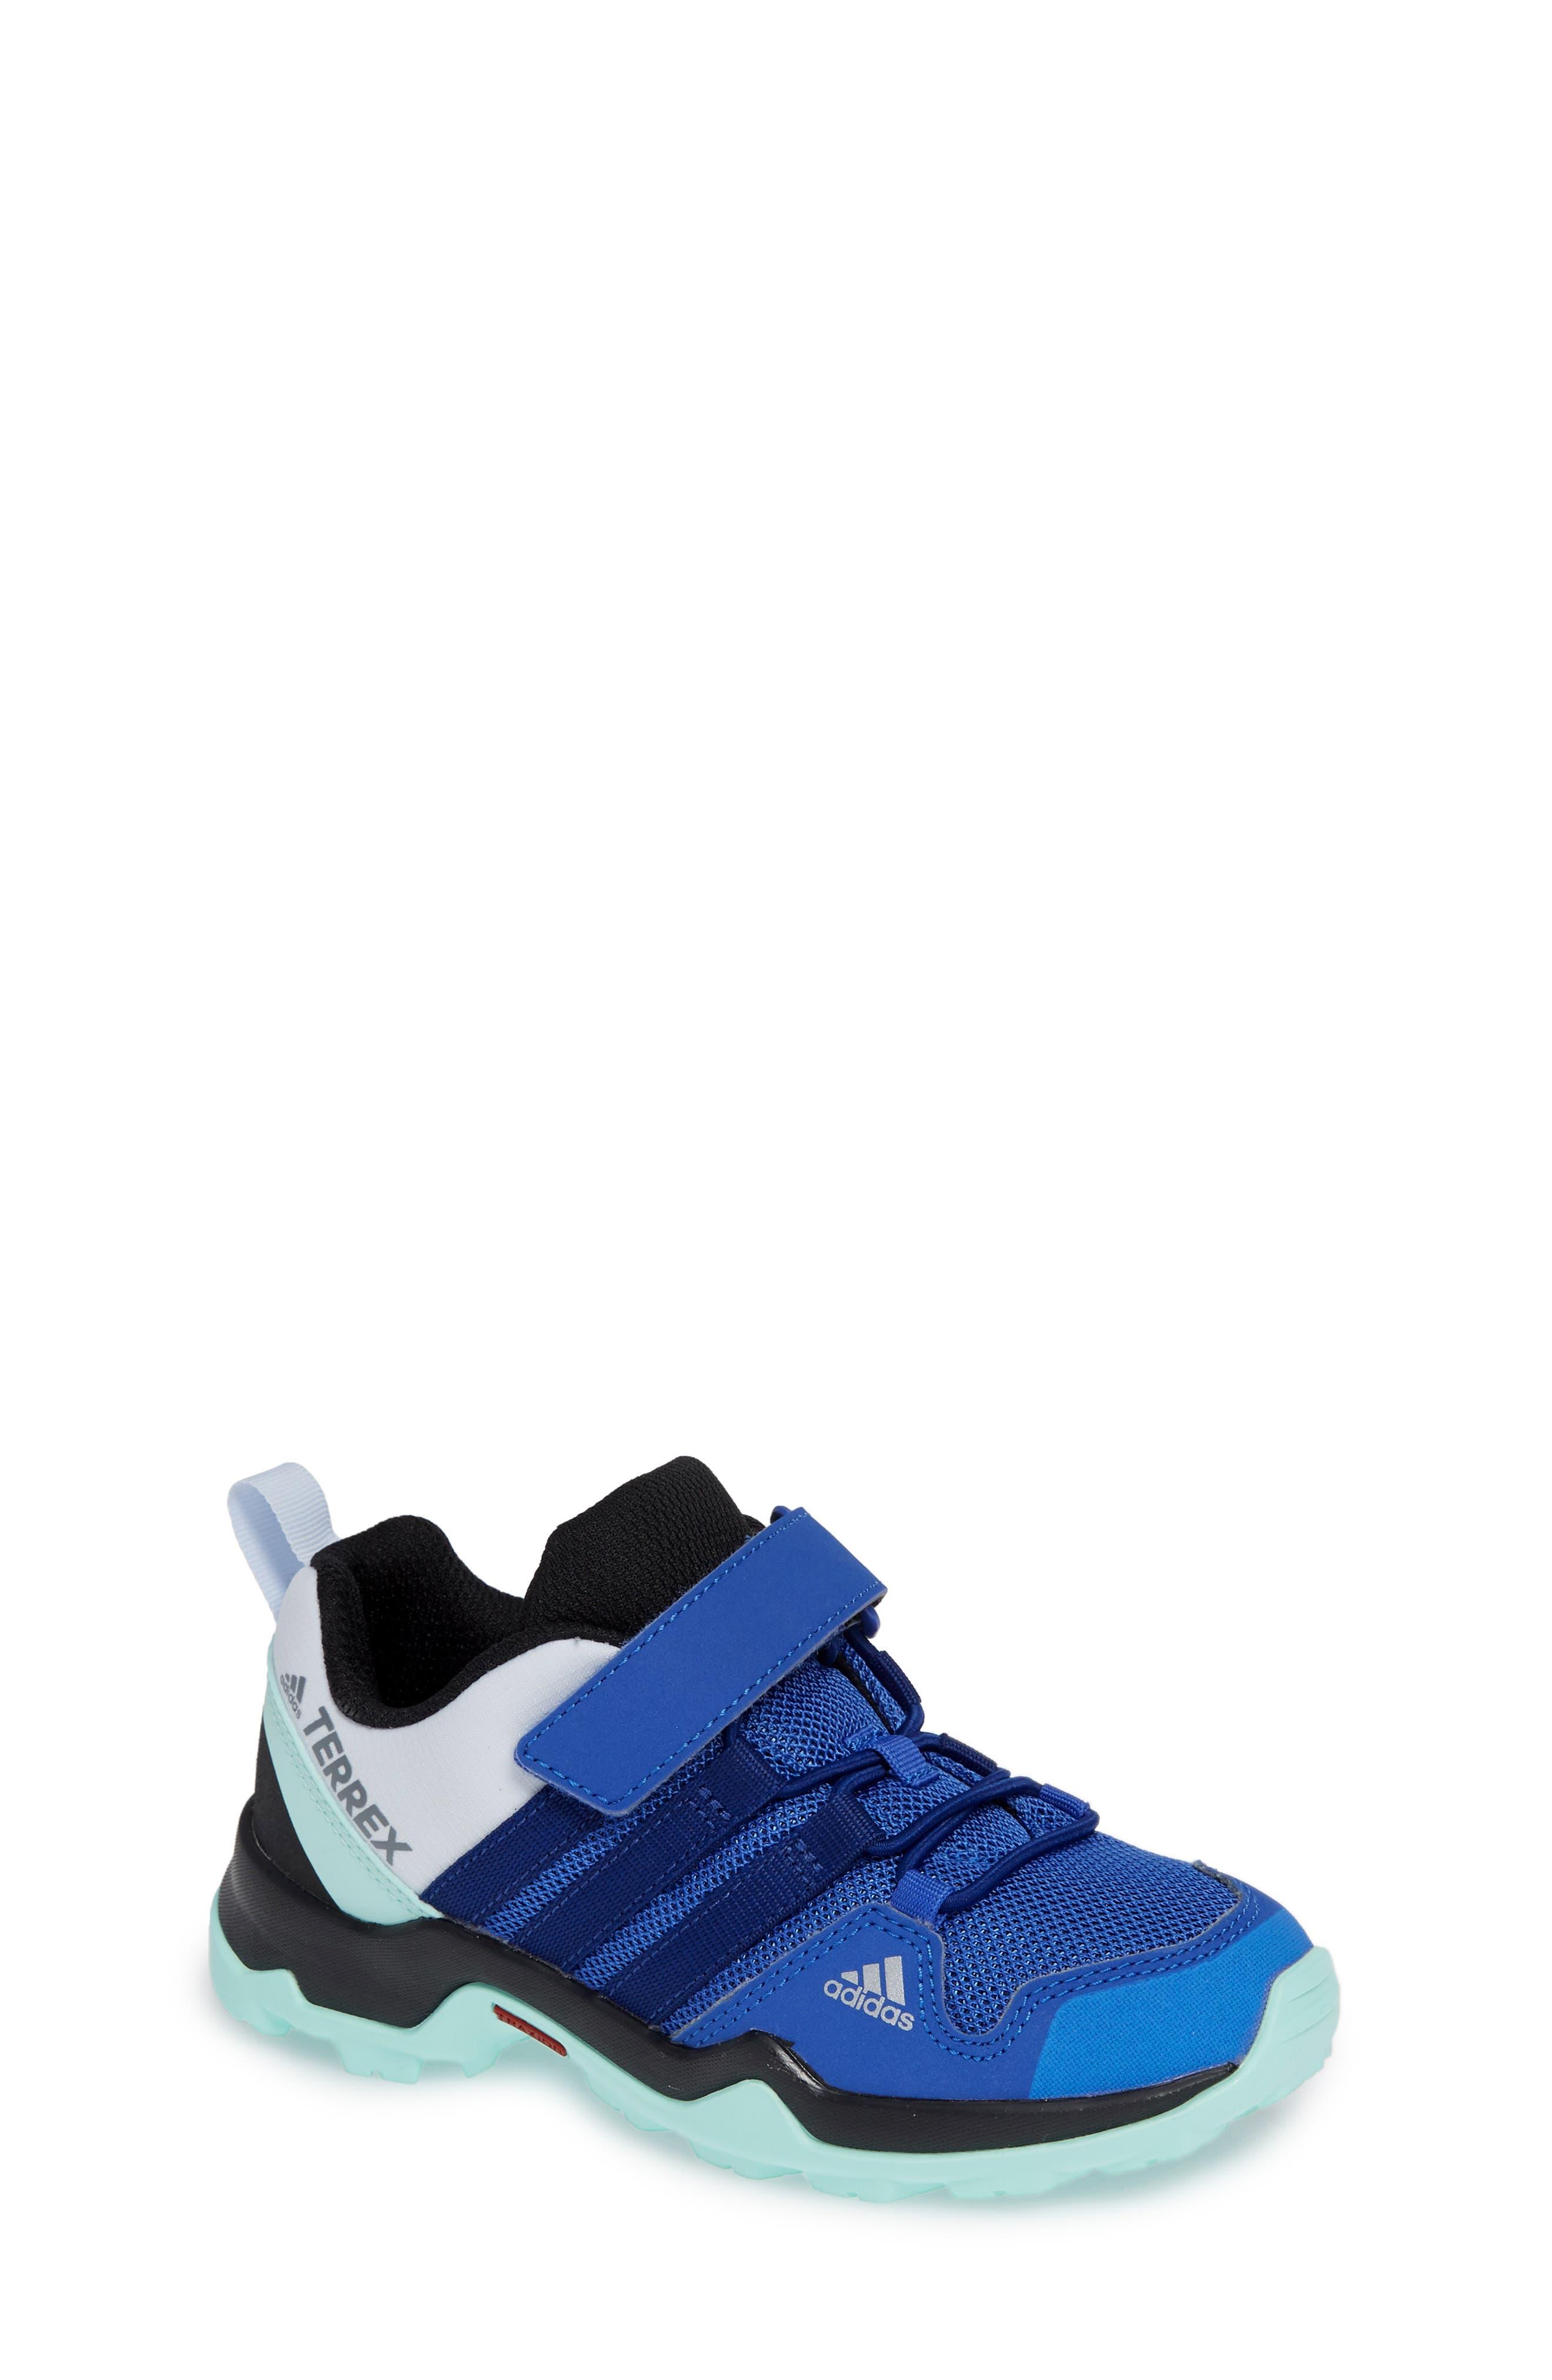 Terrex AX2R Sneaker,                             Main thumbnail 1, color,                             HI-RES BLUE/ MYSTERY INK/ MINT